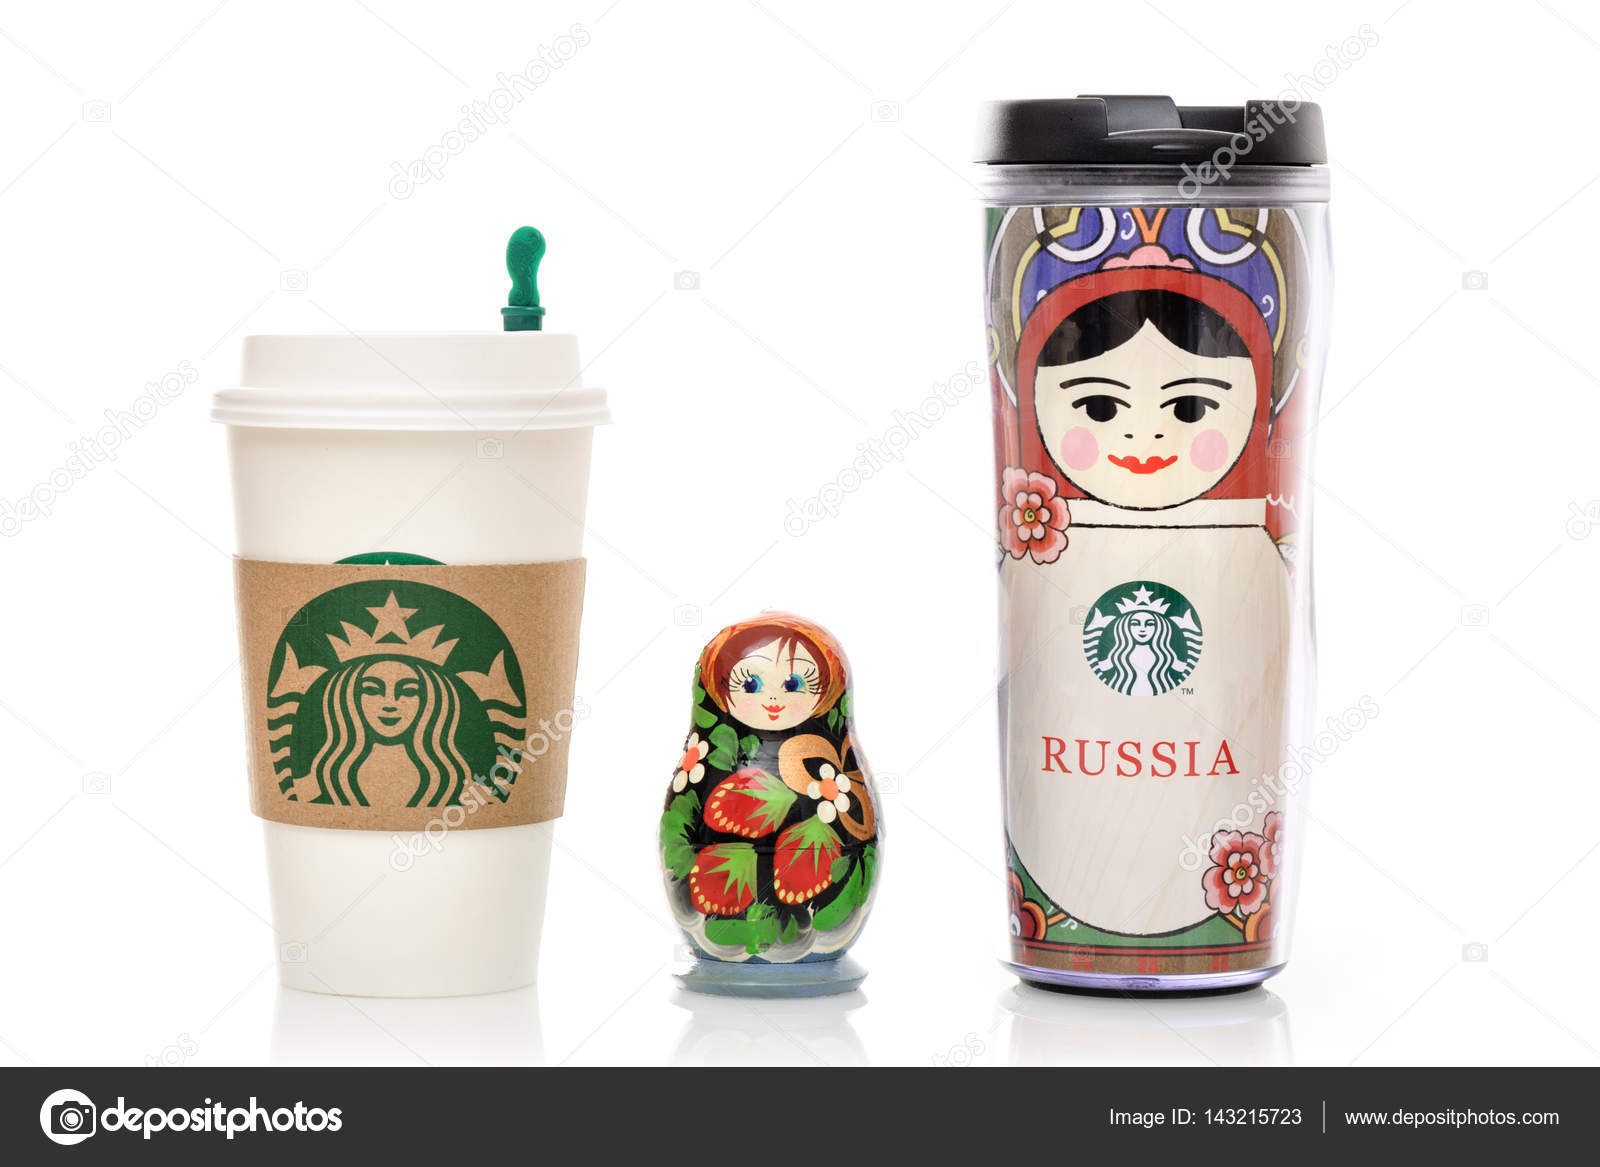 Jual Starbucks Tumbler Indonesia City Folklore Palembang Edition